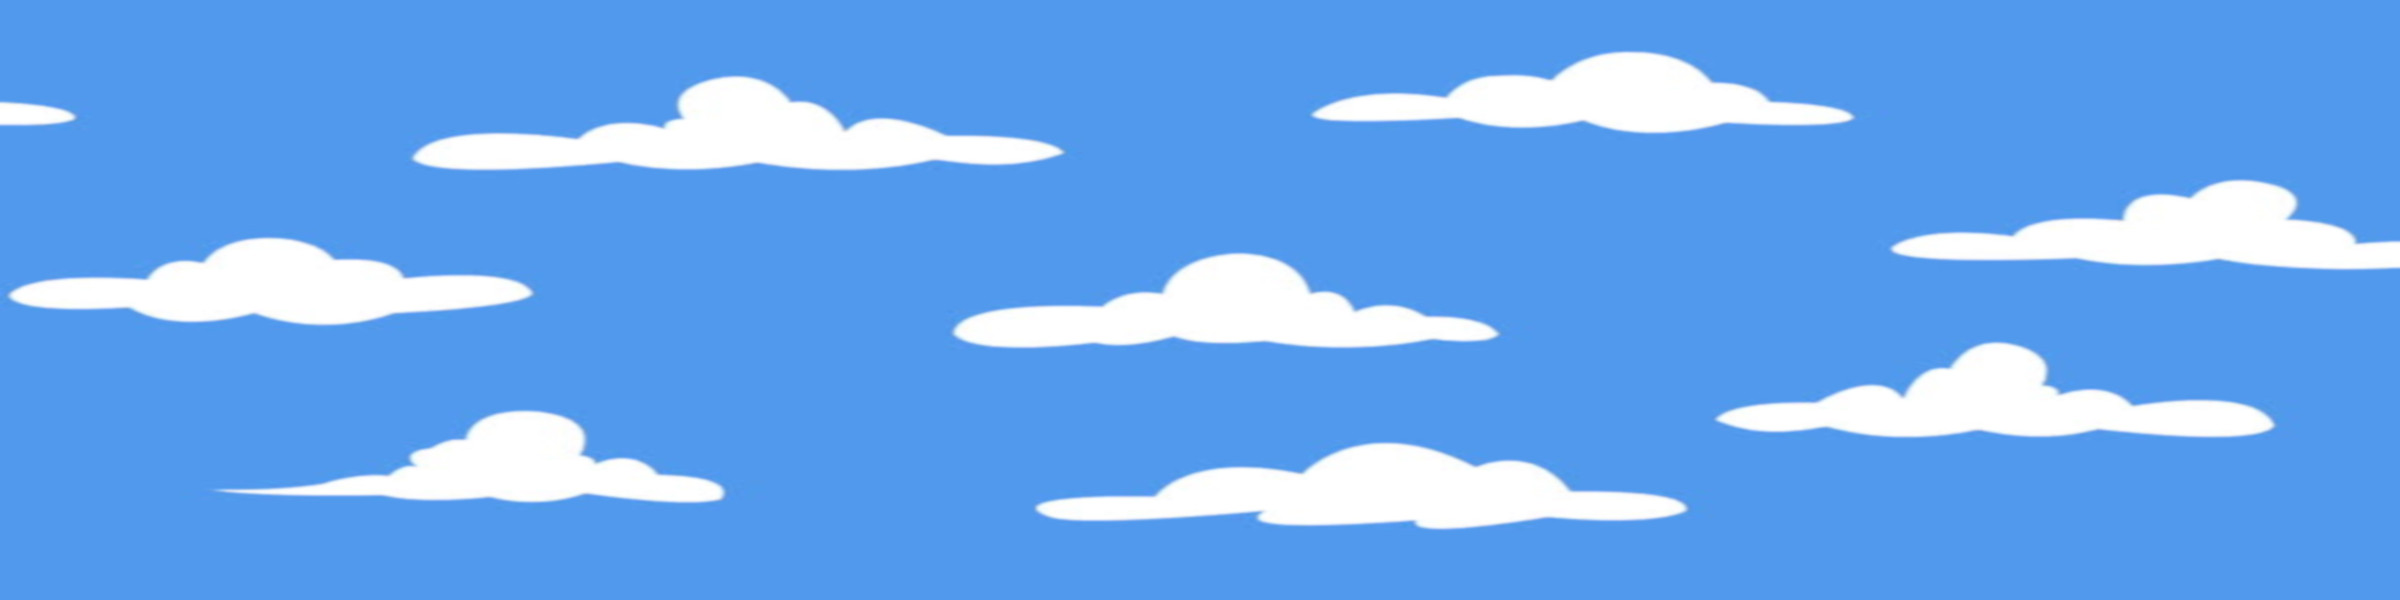 src/components/images/sky.jpg